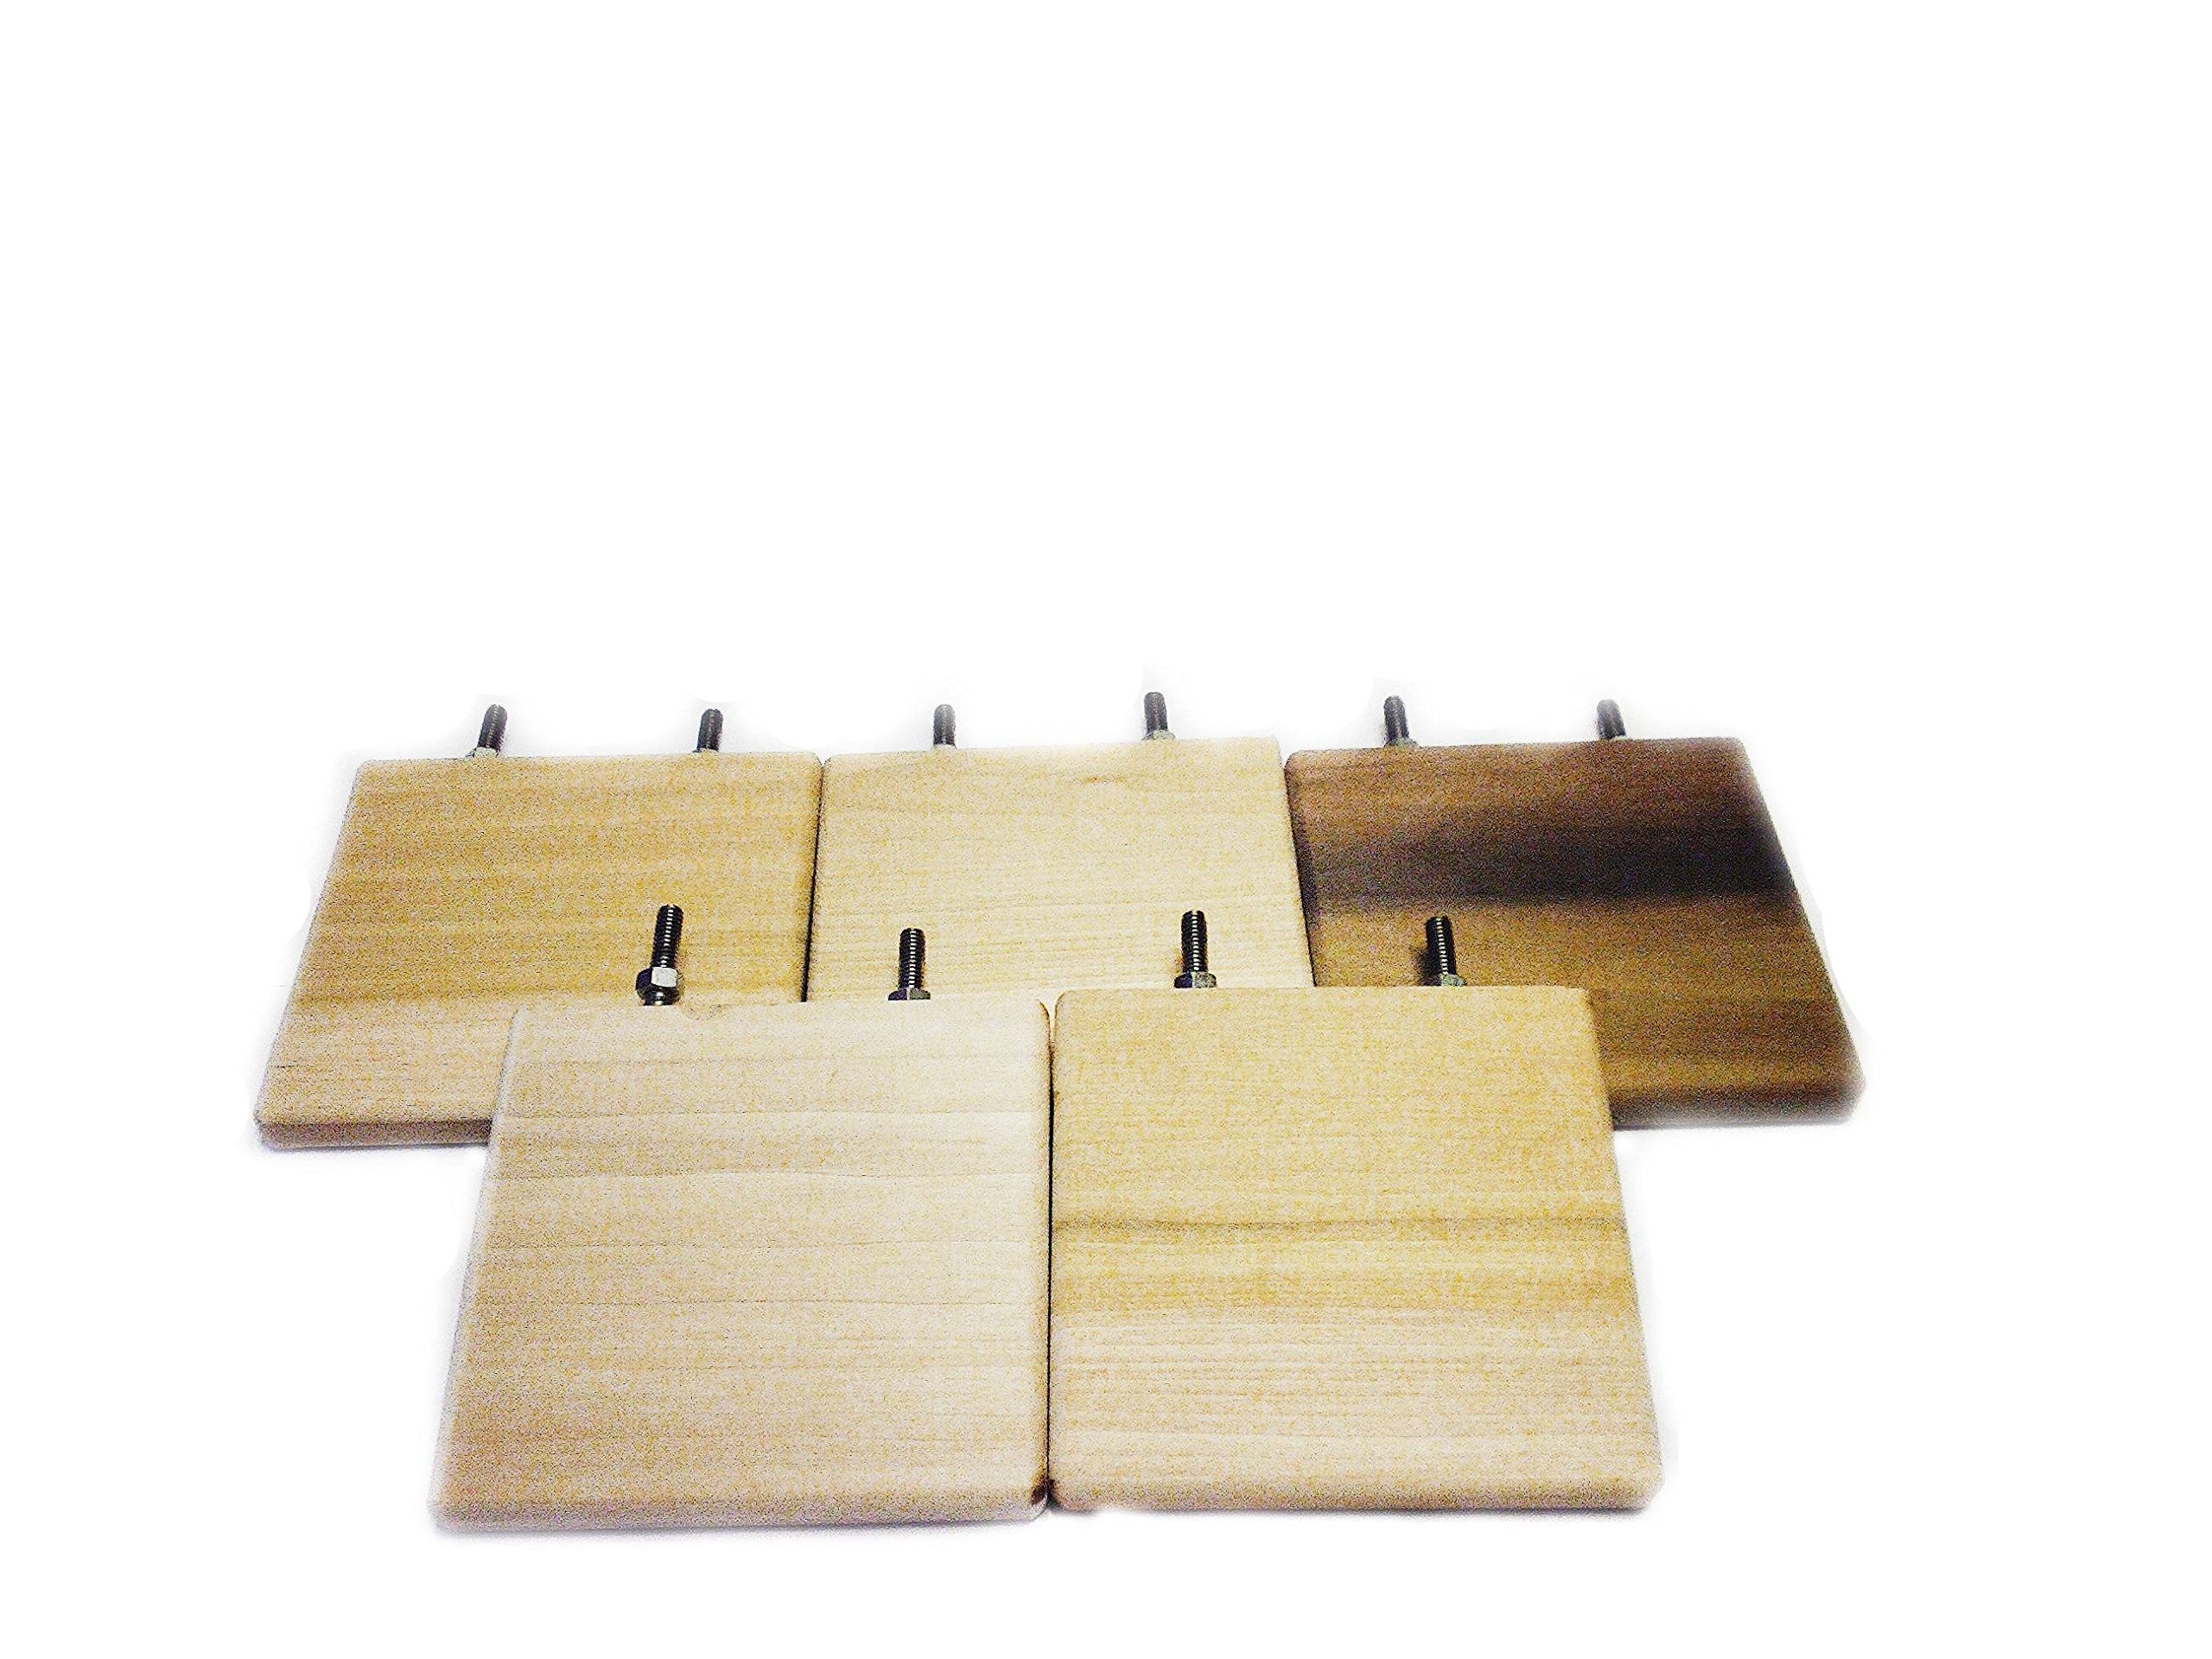 Heavenly Ledges large 6 inch poplar wood chinchilla shelves pack of 5